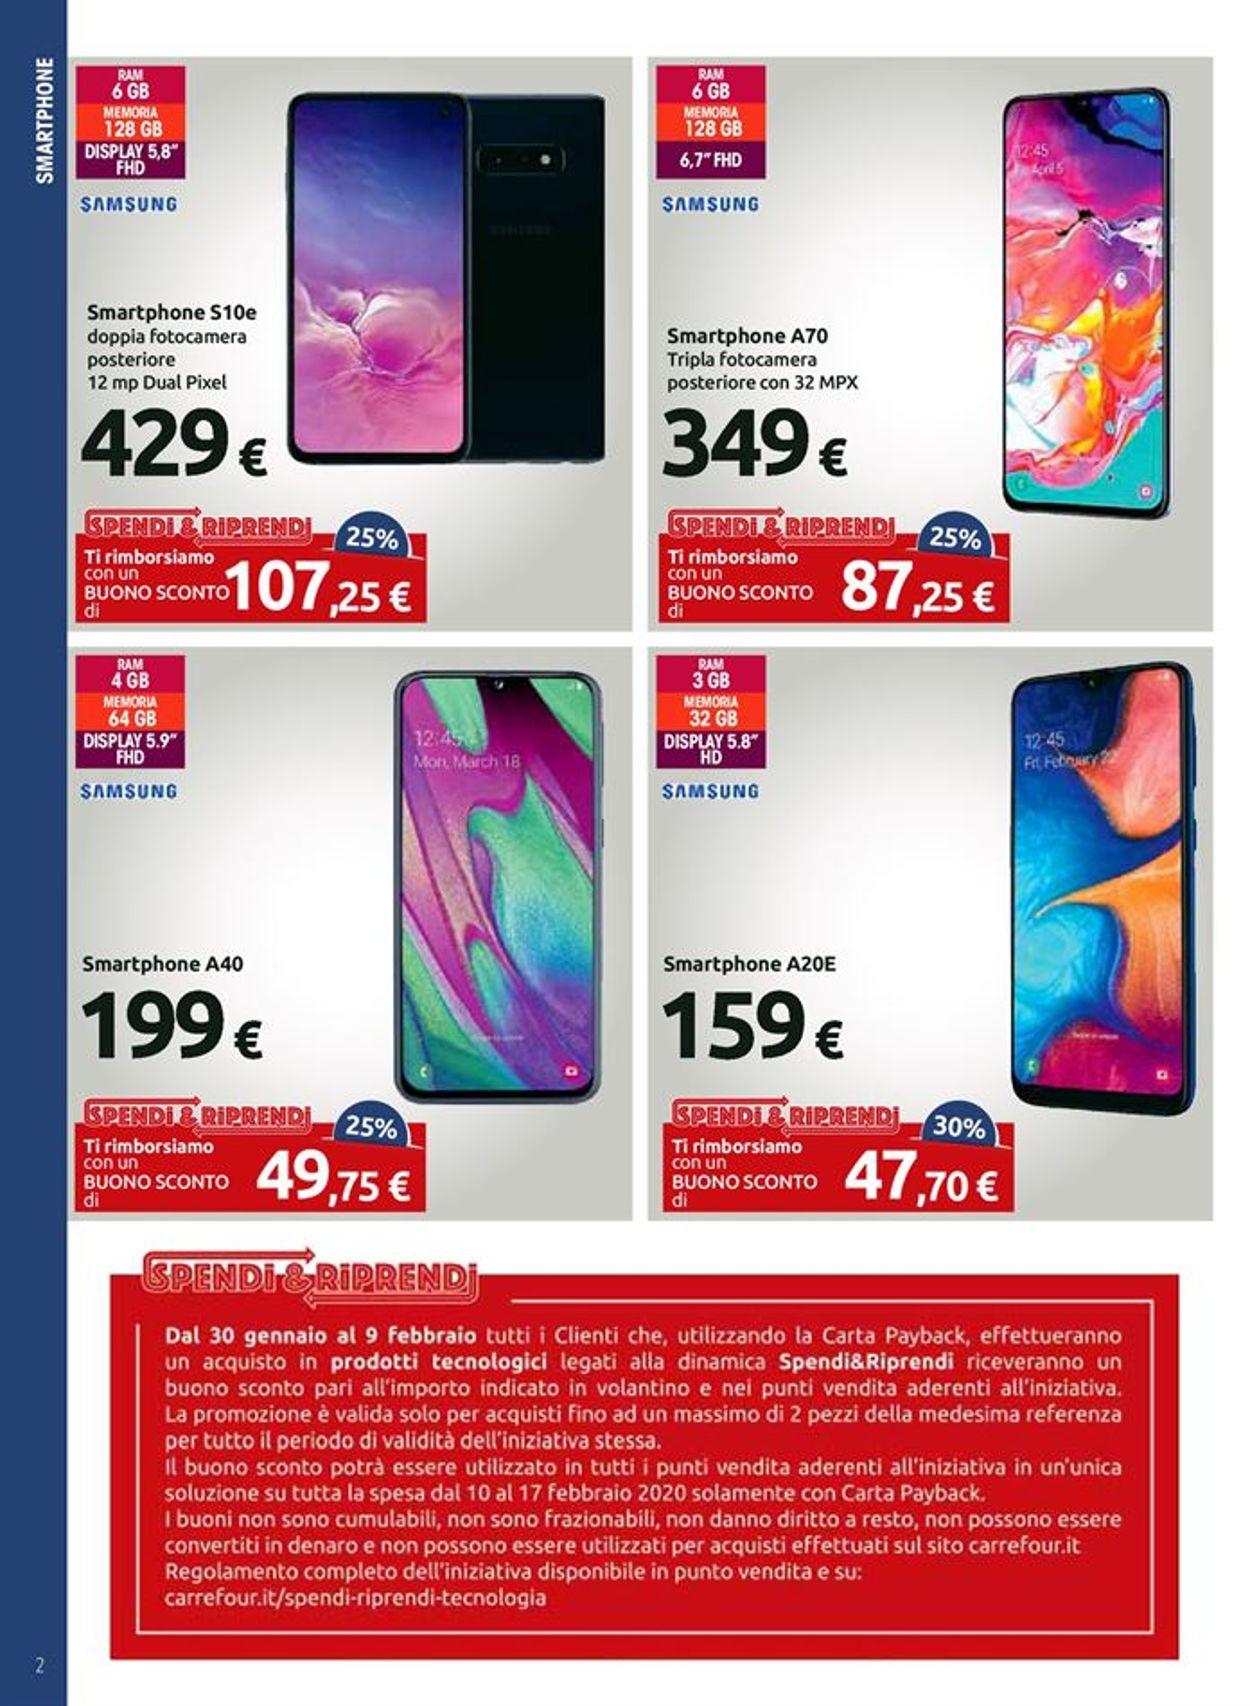 Volantino Carrefour - Offerte 30/01-09/02/2020 (Pagina 2)